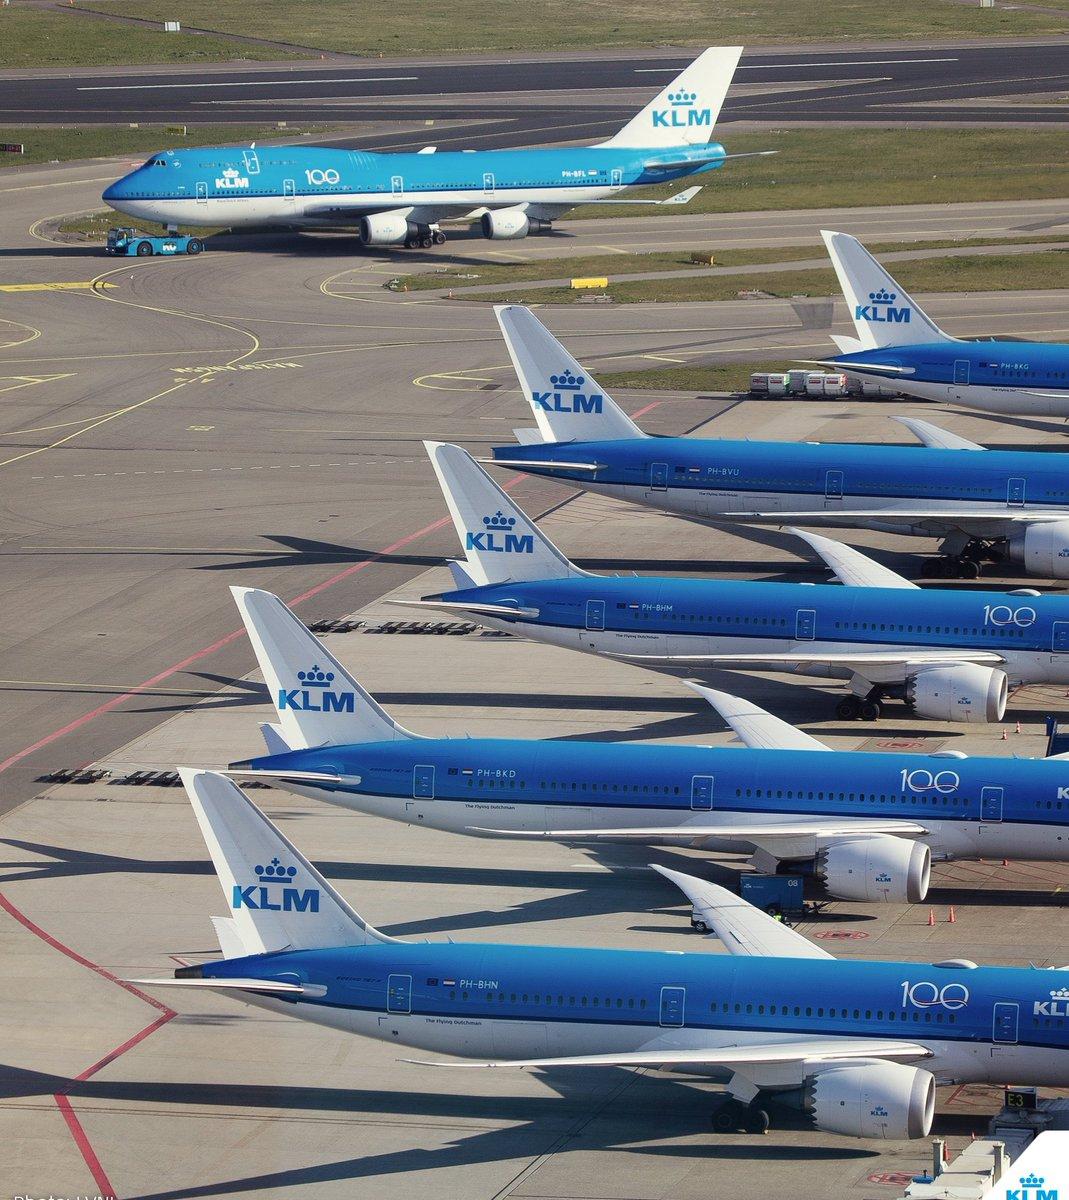 10500 aviones están en tierra a causa del #coronavirus. https://pulsoguayaco.blogspot.com/2020/04/coronavirus-espacio-aereo-vuelos.html?spref=tw…  #AvGeek #planespotting #aviation #aviacionecuador #fly #airnews #Ecuador #Guayaquil #Quito #coronavirus #southamerica #avionpic.twitter.com/LfSV9n7XJZ